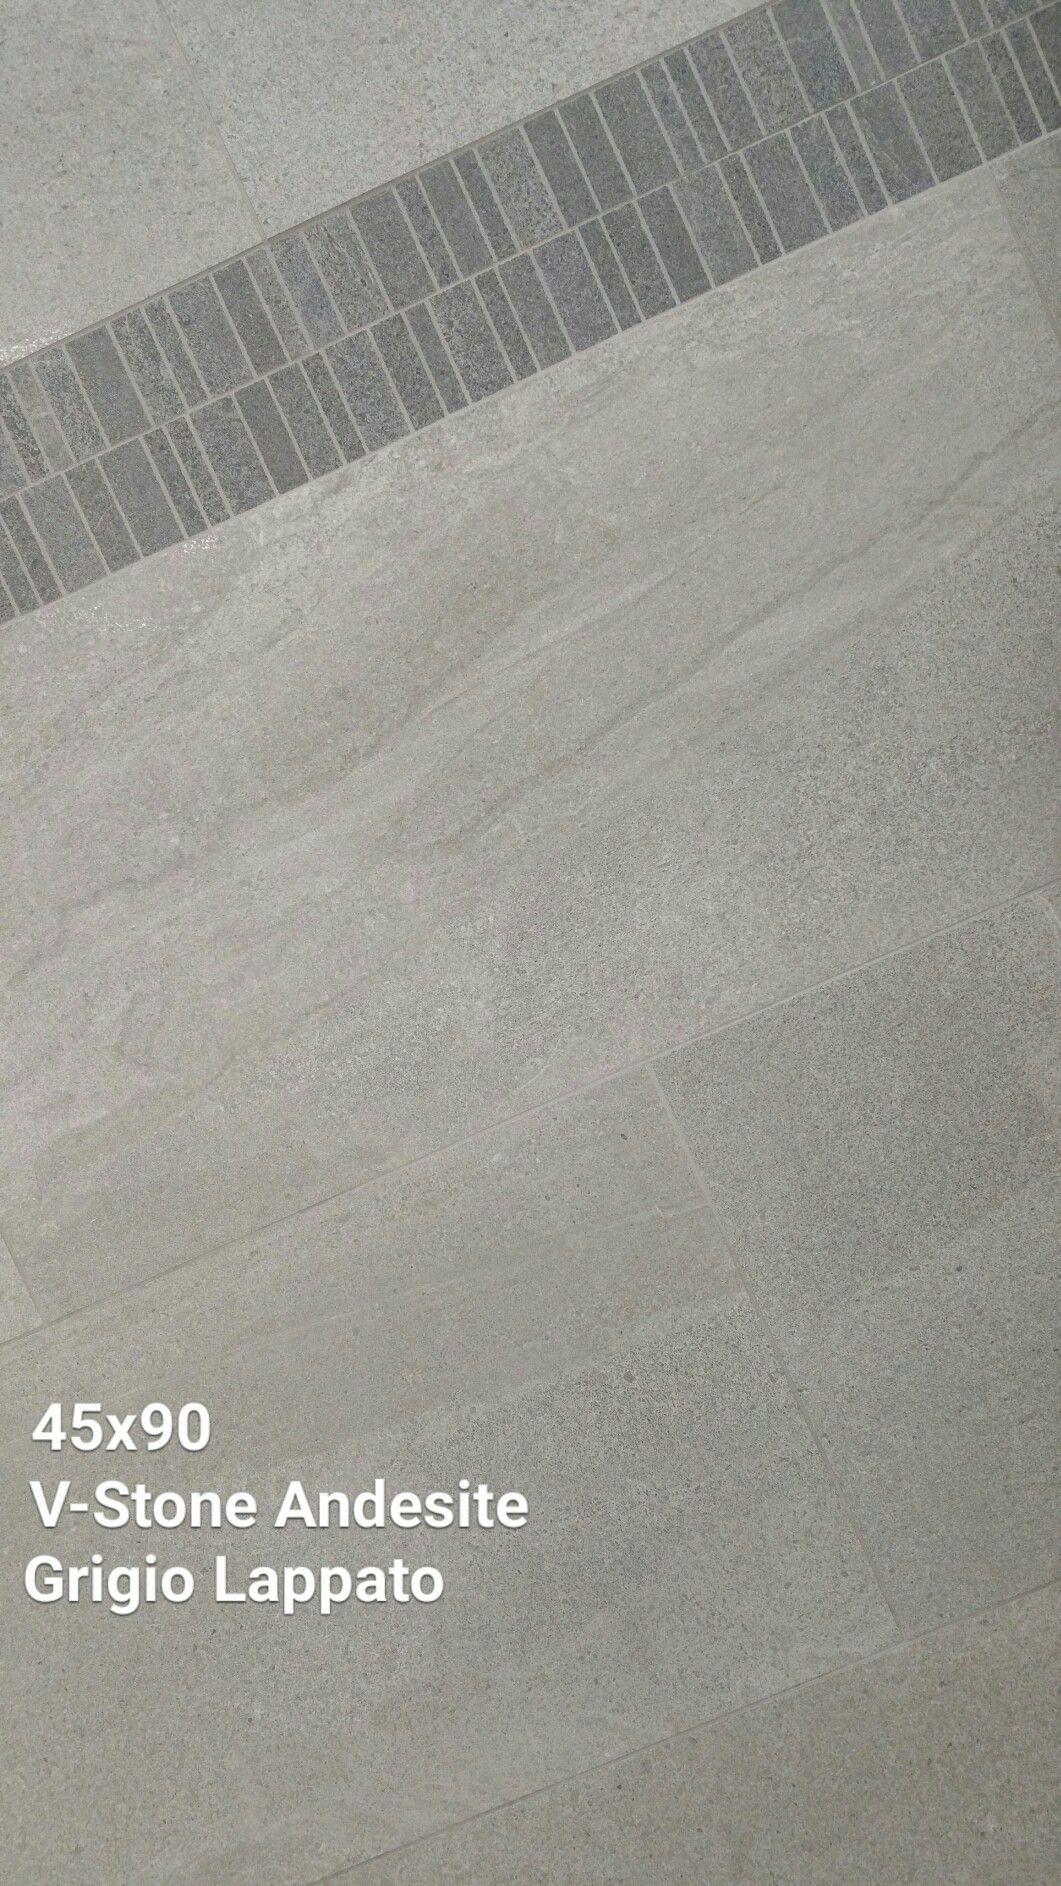 45x90 V-Stone obesidian anthracite is a glazed porcelain tile with a semi polished finish  #tiles #walltiles #floortiles #tileideas #largeformat #porcelain #bathroomdesign #kitchendesign #livingroomdesign #design #home #homedecor #homedesign #bathroomtiles #kitchentiles